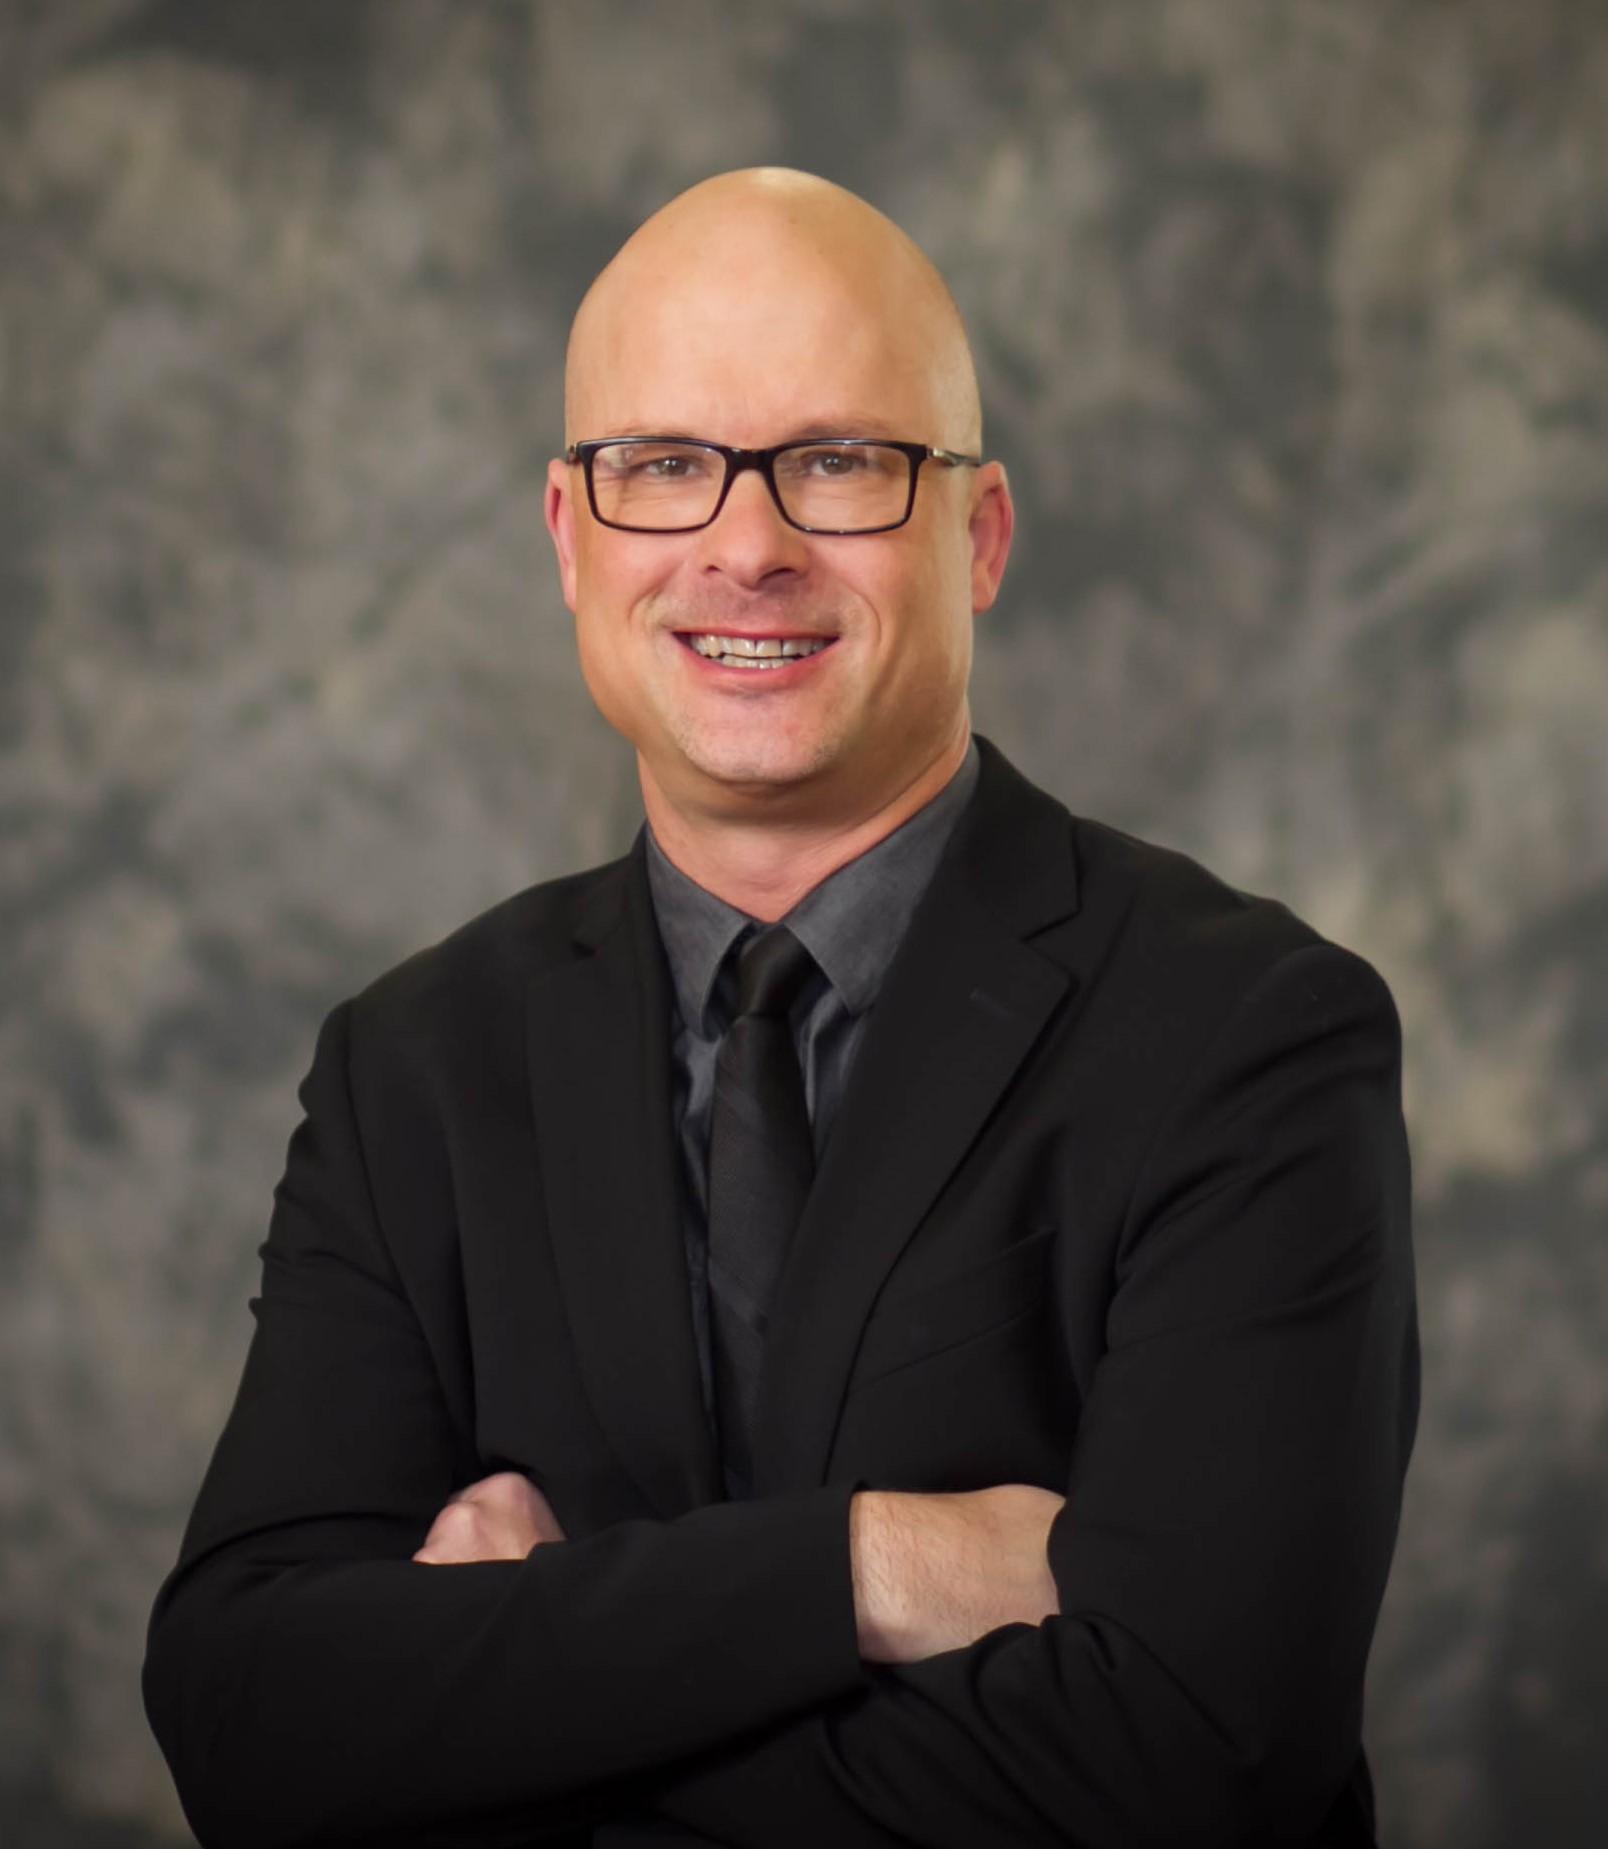 Tim Hron, Director of Behavioral Health Business Development/Therapist